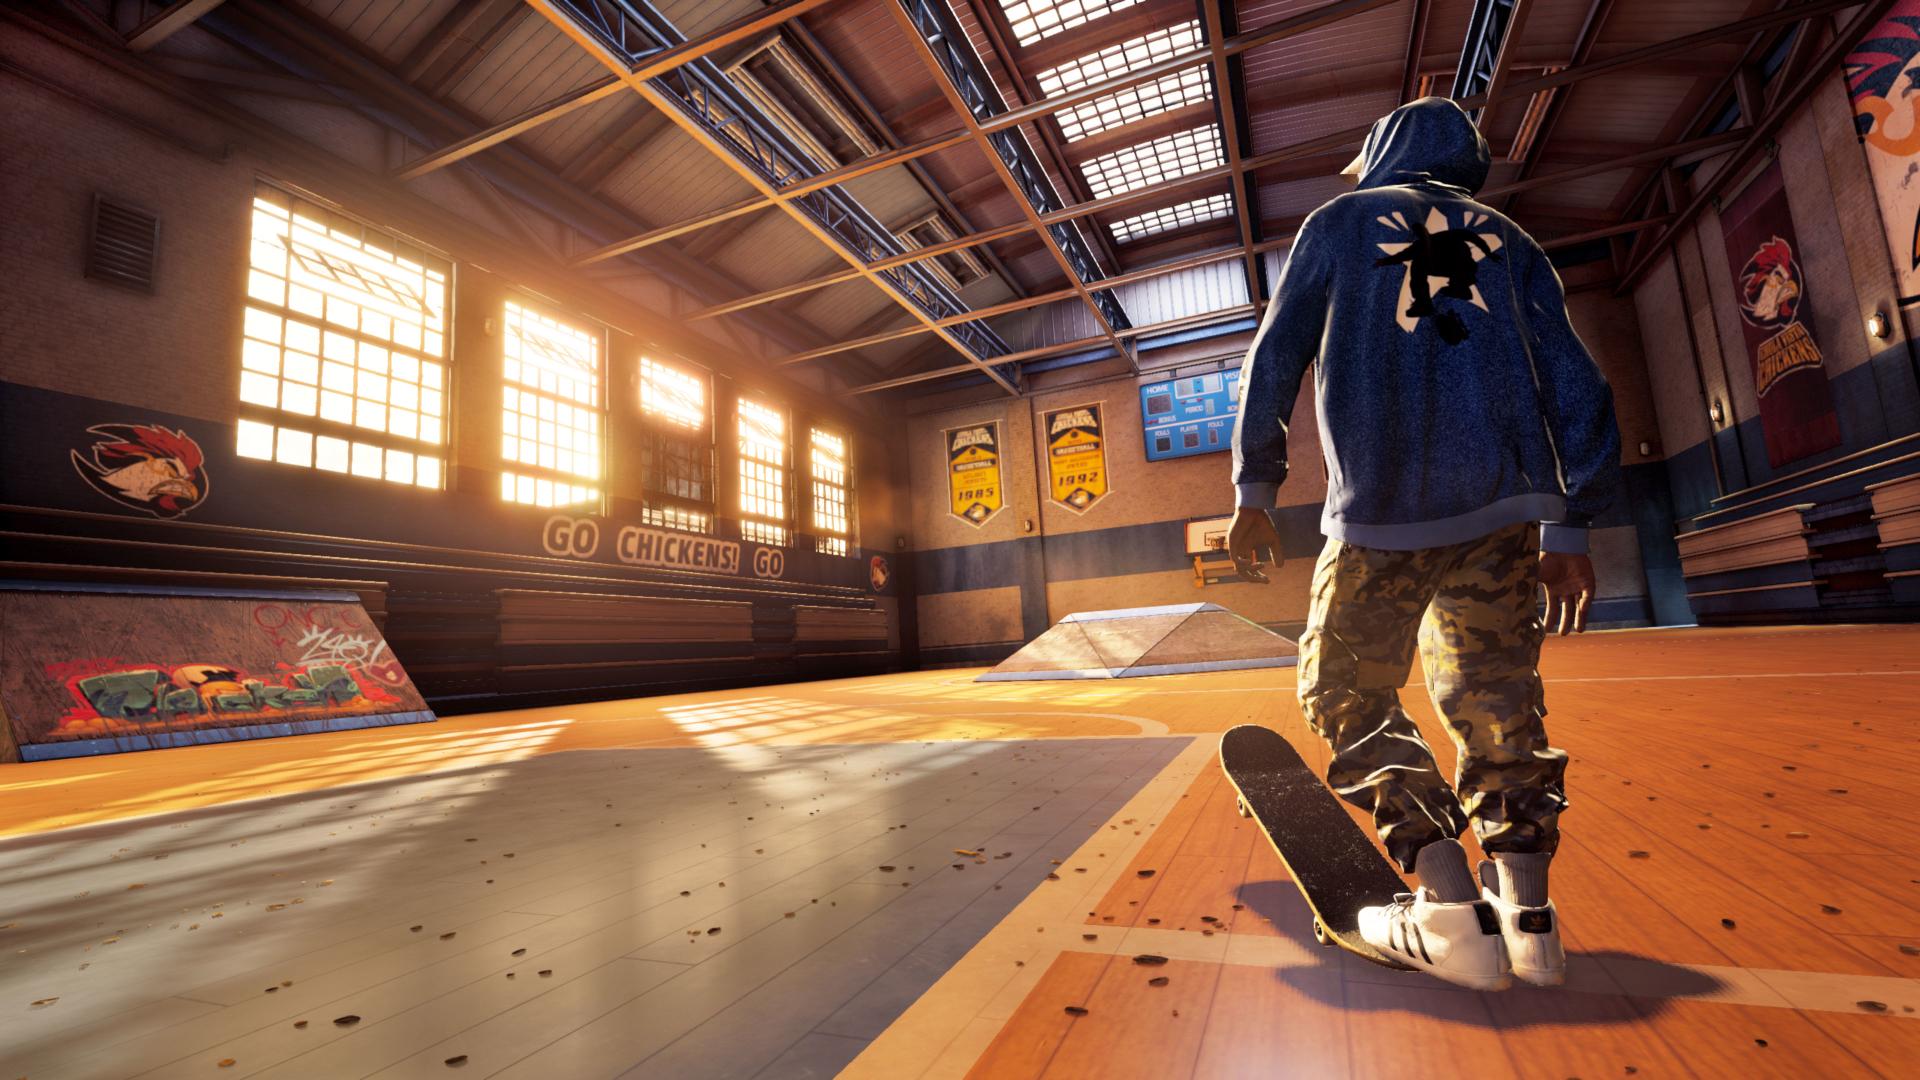 Tony Hawk Pro Skater 1+2 - PS4 - Wallpapers - 1920x1080